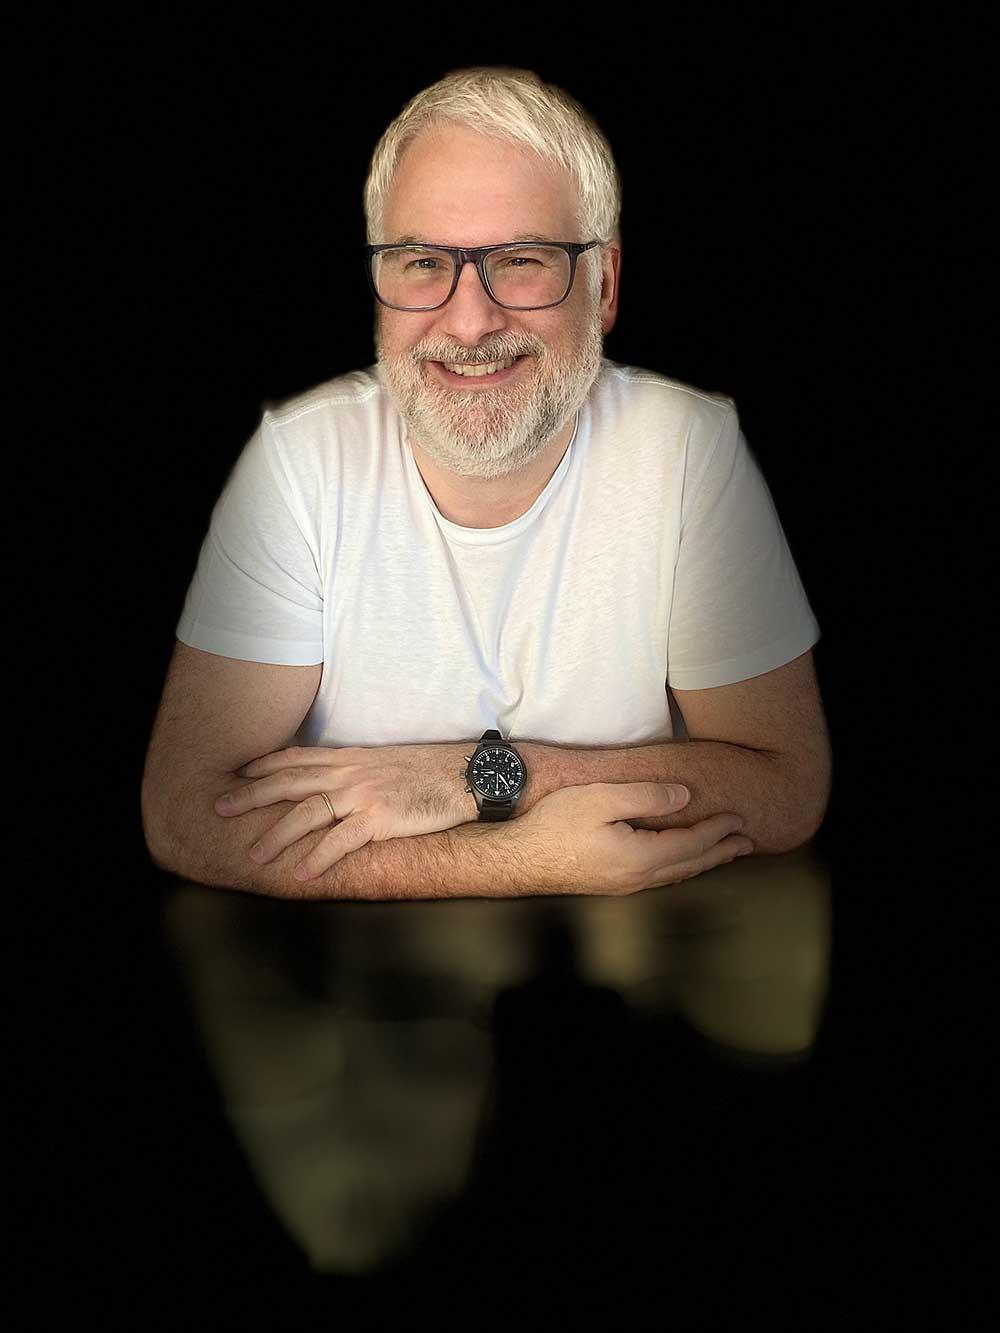 Alexandre Frangioni